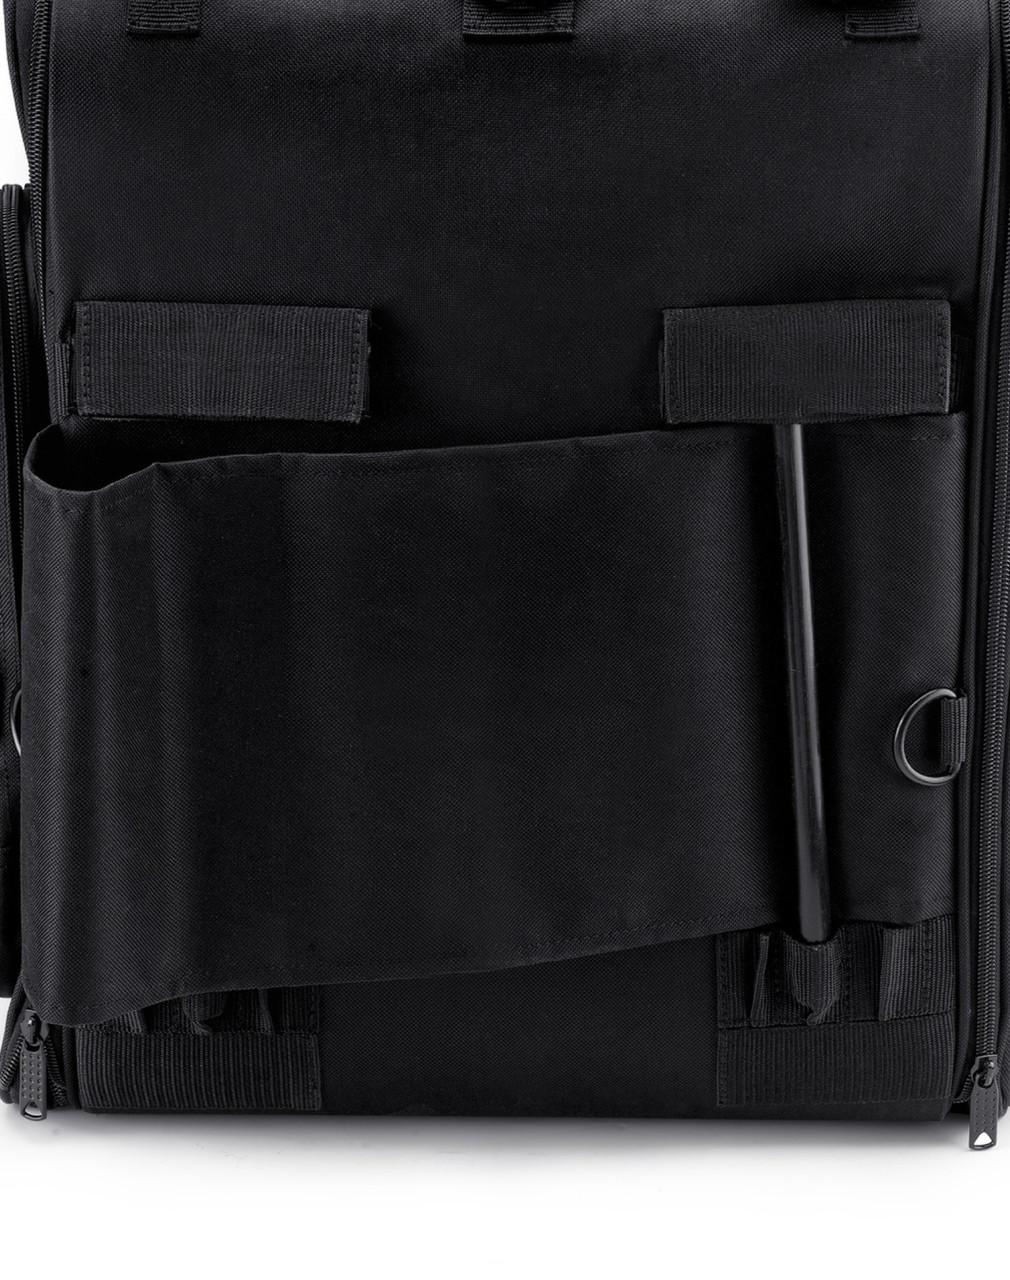 Honda Viking Extra Large Plain Motorcycle Tail Bag Back Side View